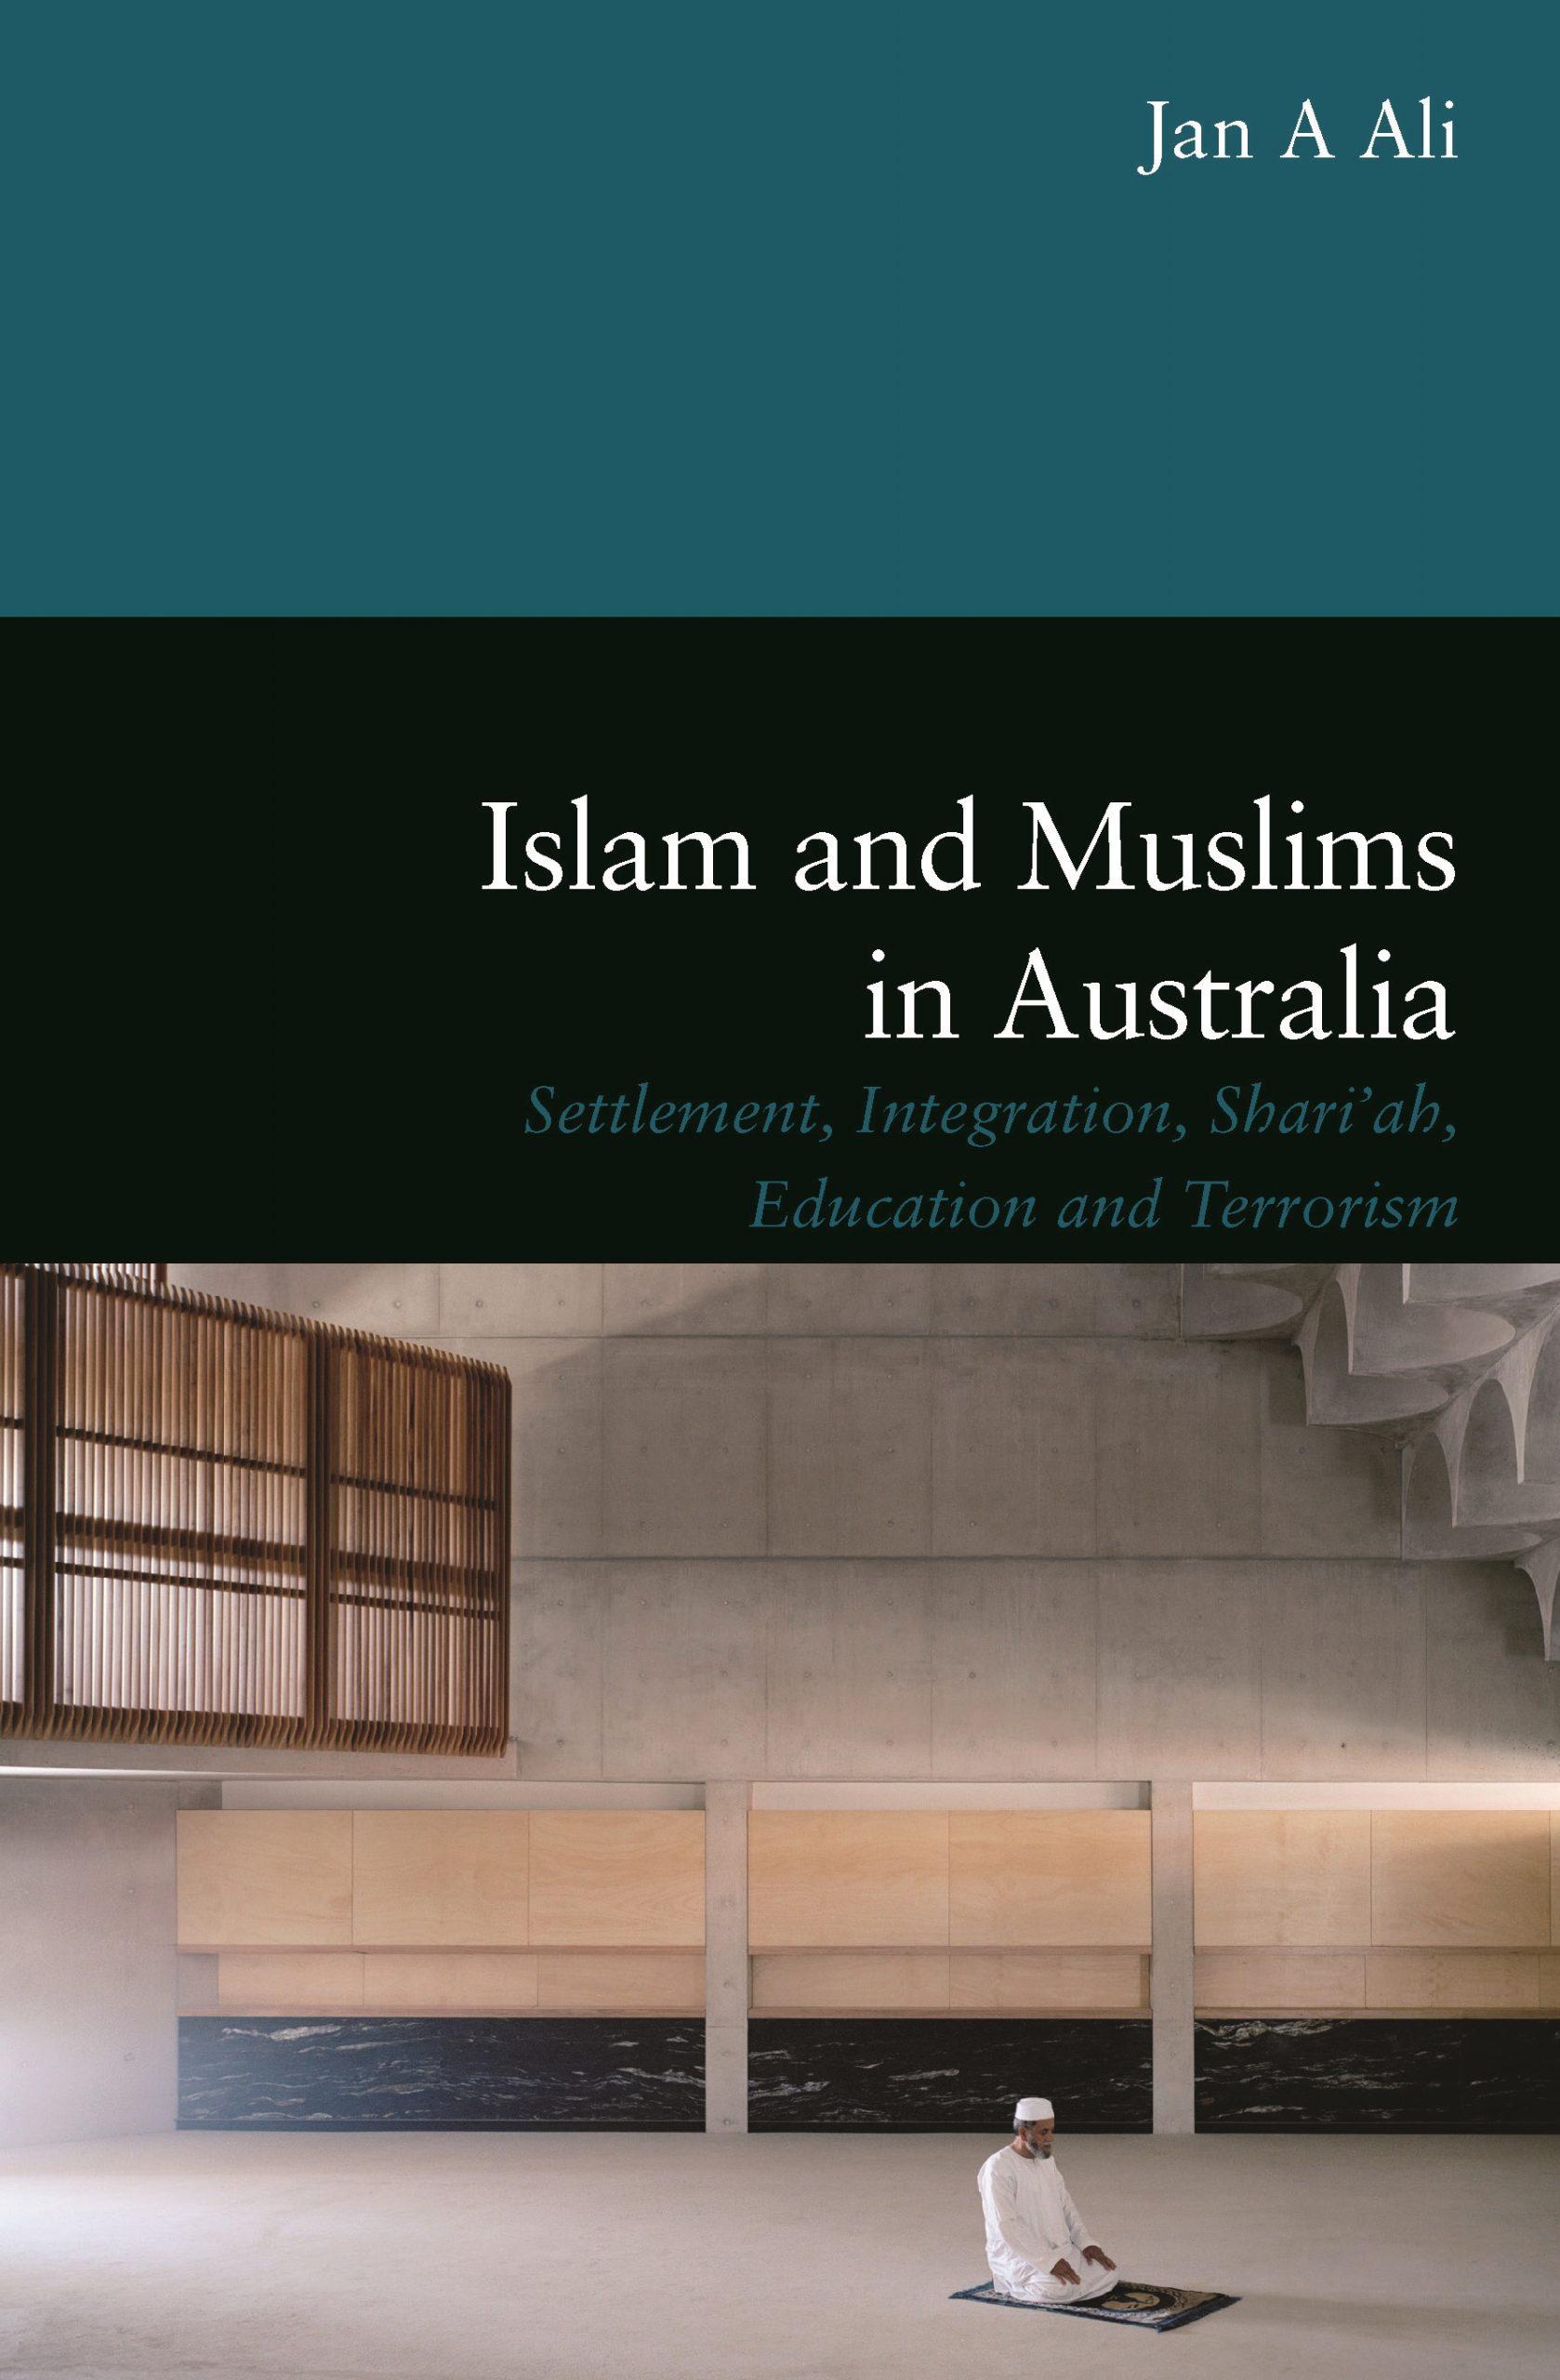 Melbourne University Press